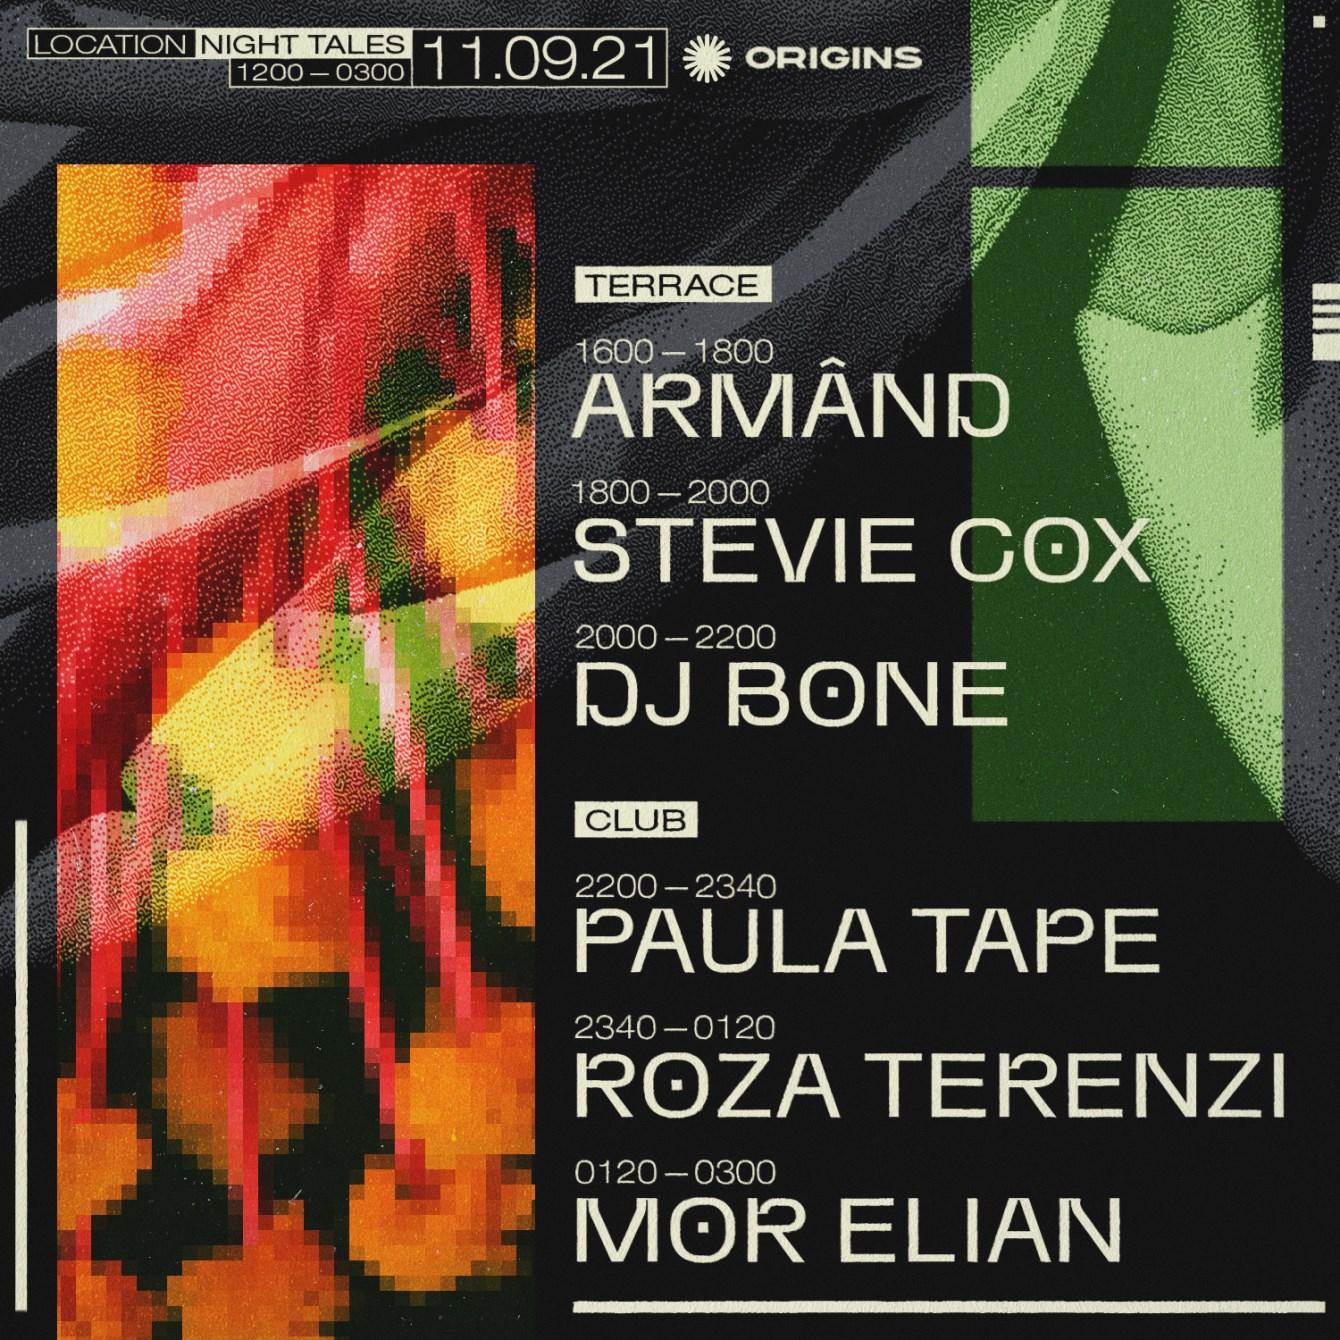 Origins: DJ Bone, Roza Terenzi, Mor Elian, Paula Tape & Stevie Cox - Flyer back